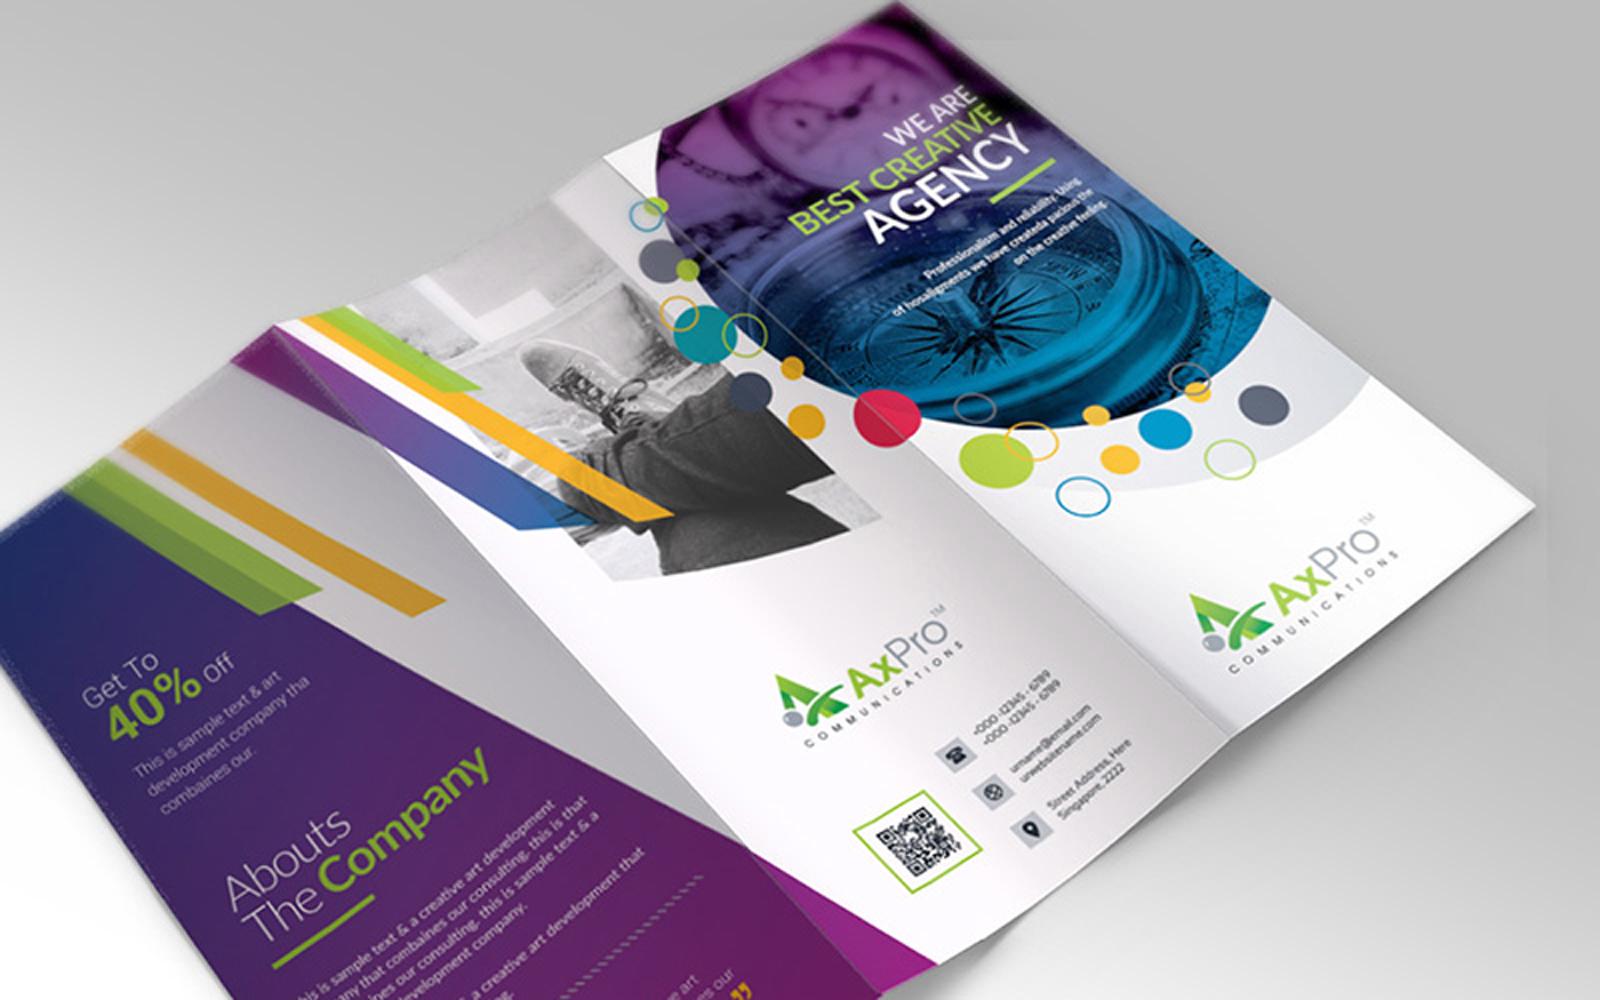 Colorful Circle and Geometric Design Gradient Tri-fold Brochure Design Template